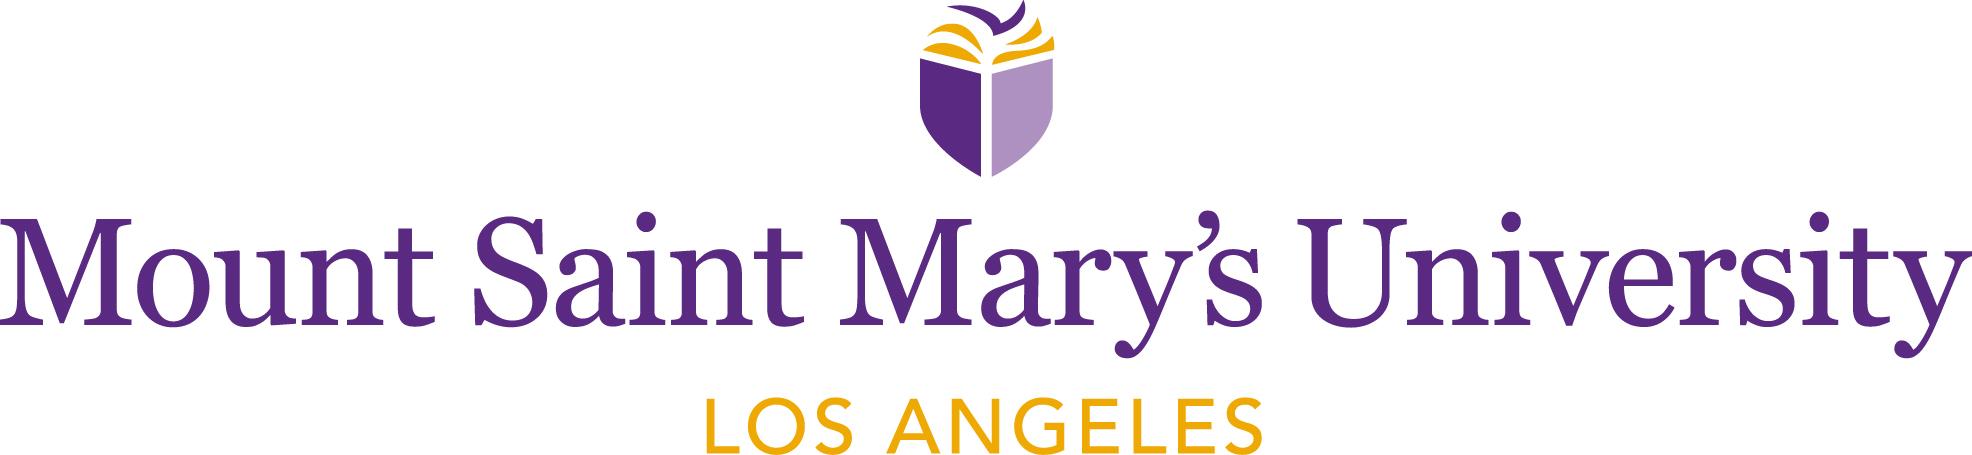 Mount Saint Marys University Los Angeles